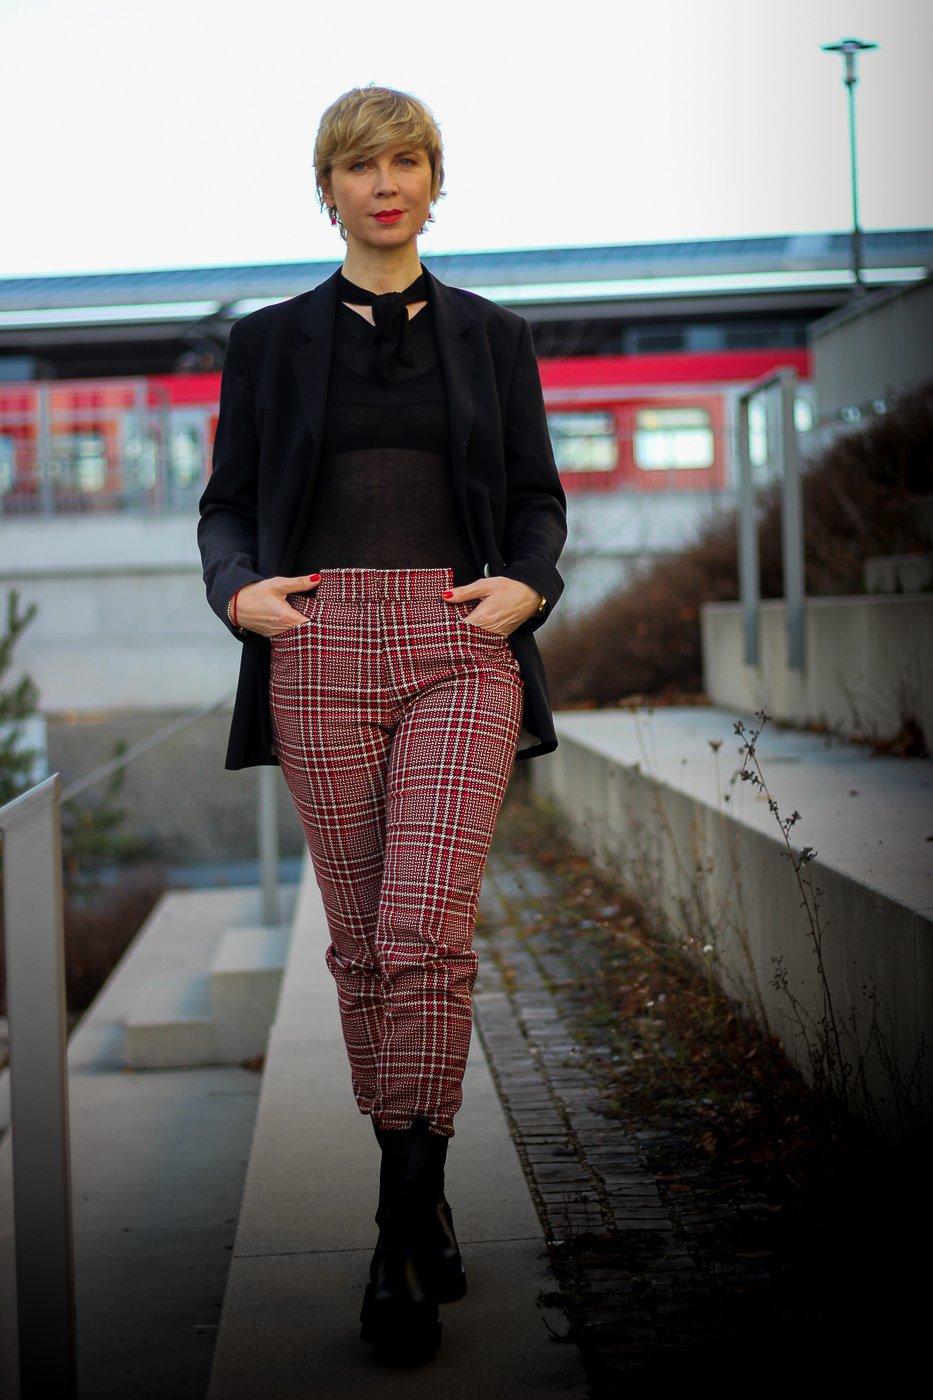 conny doll lifestyle: Herbstlook, unkompliziert, schwarzes Schuppenshirt, Chunkyboots